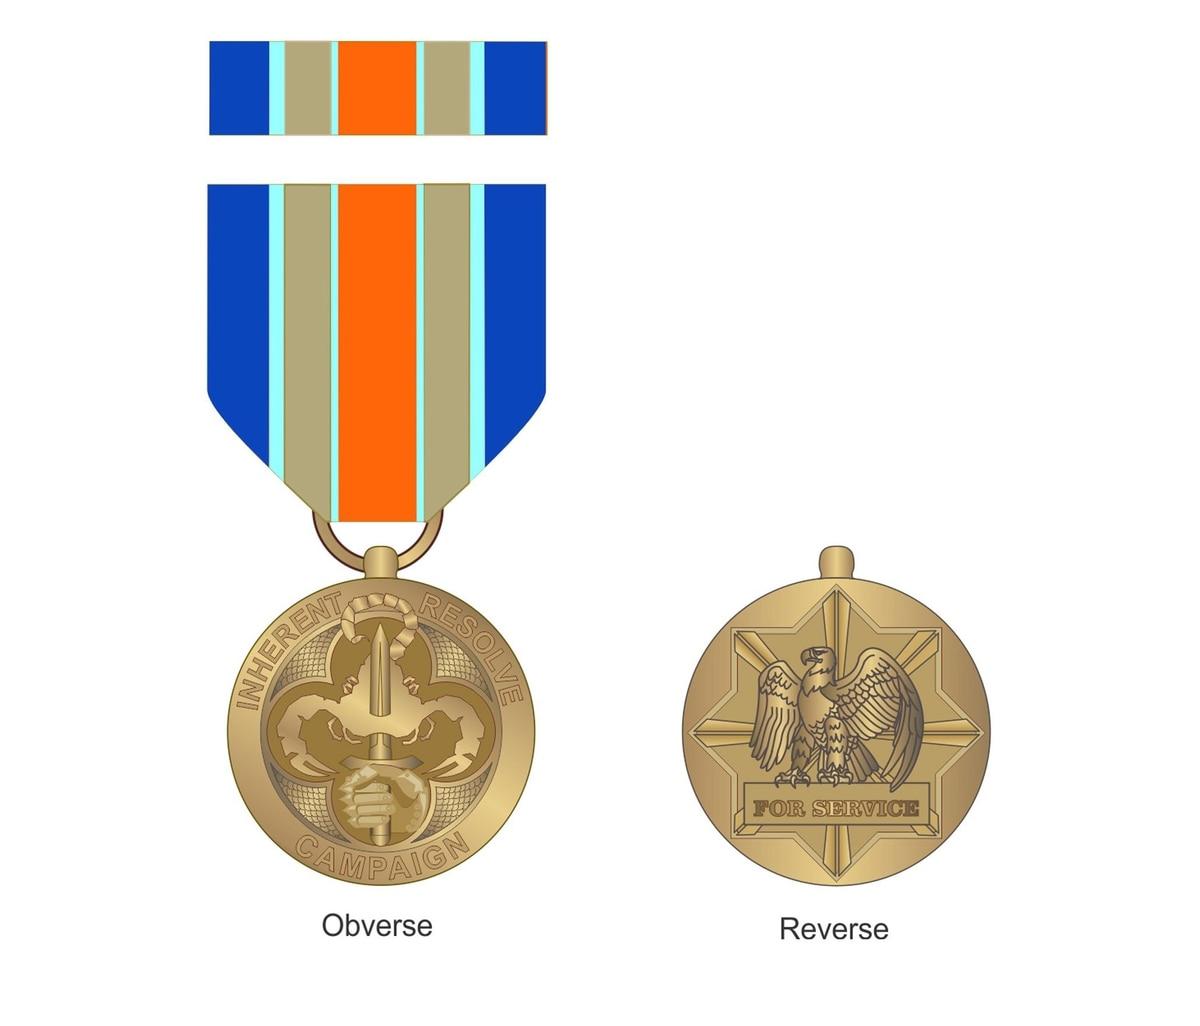 Award Rules Set For Inherent Resolve Campaign Medal